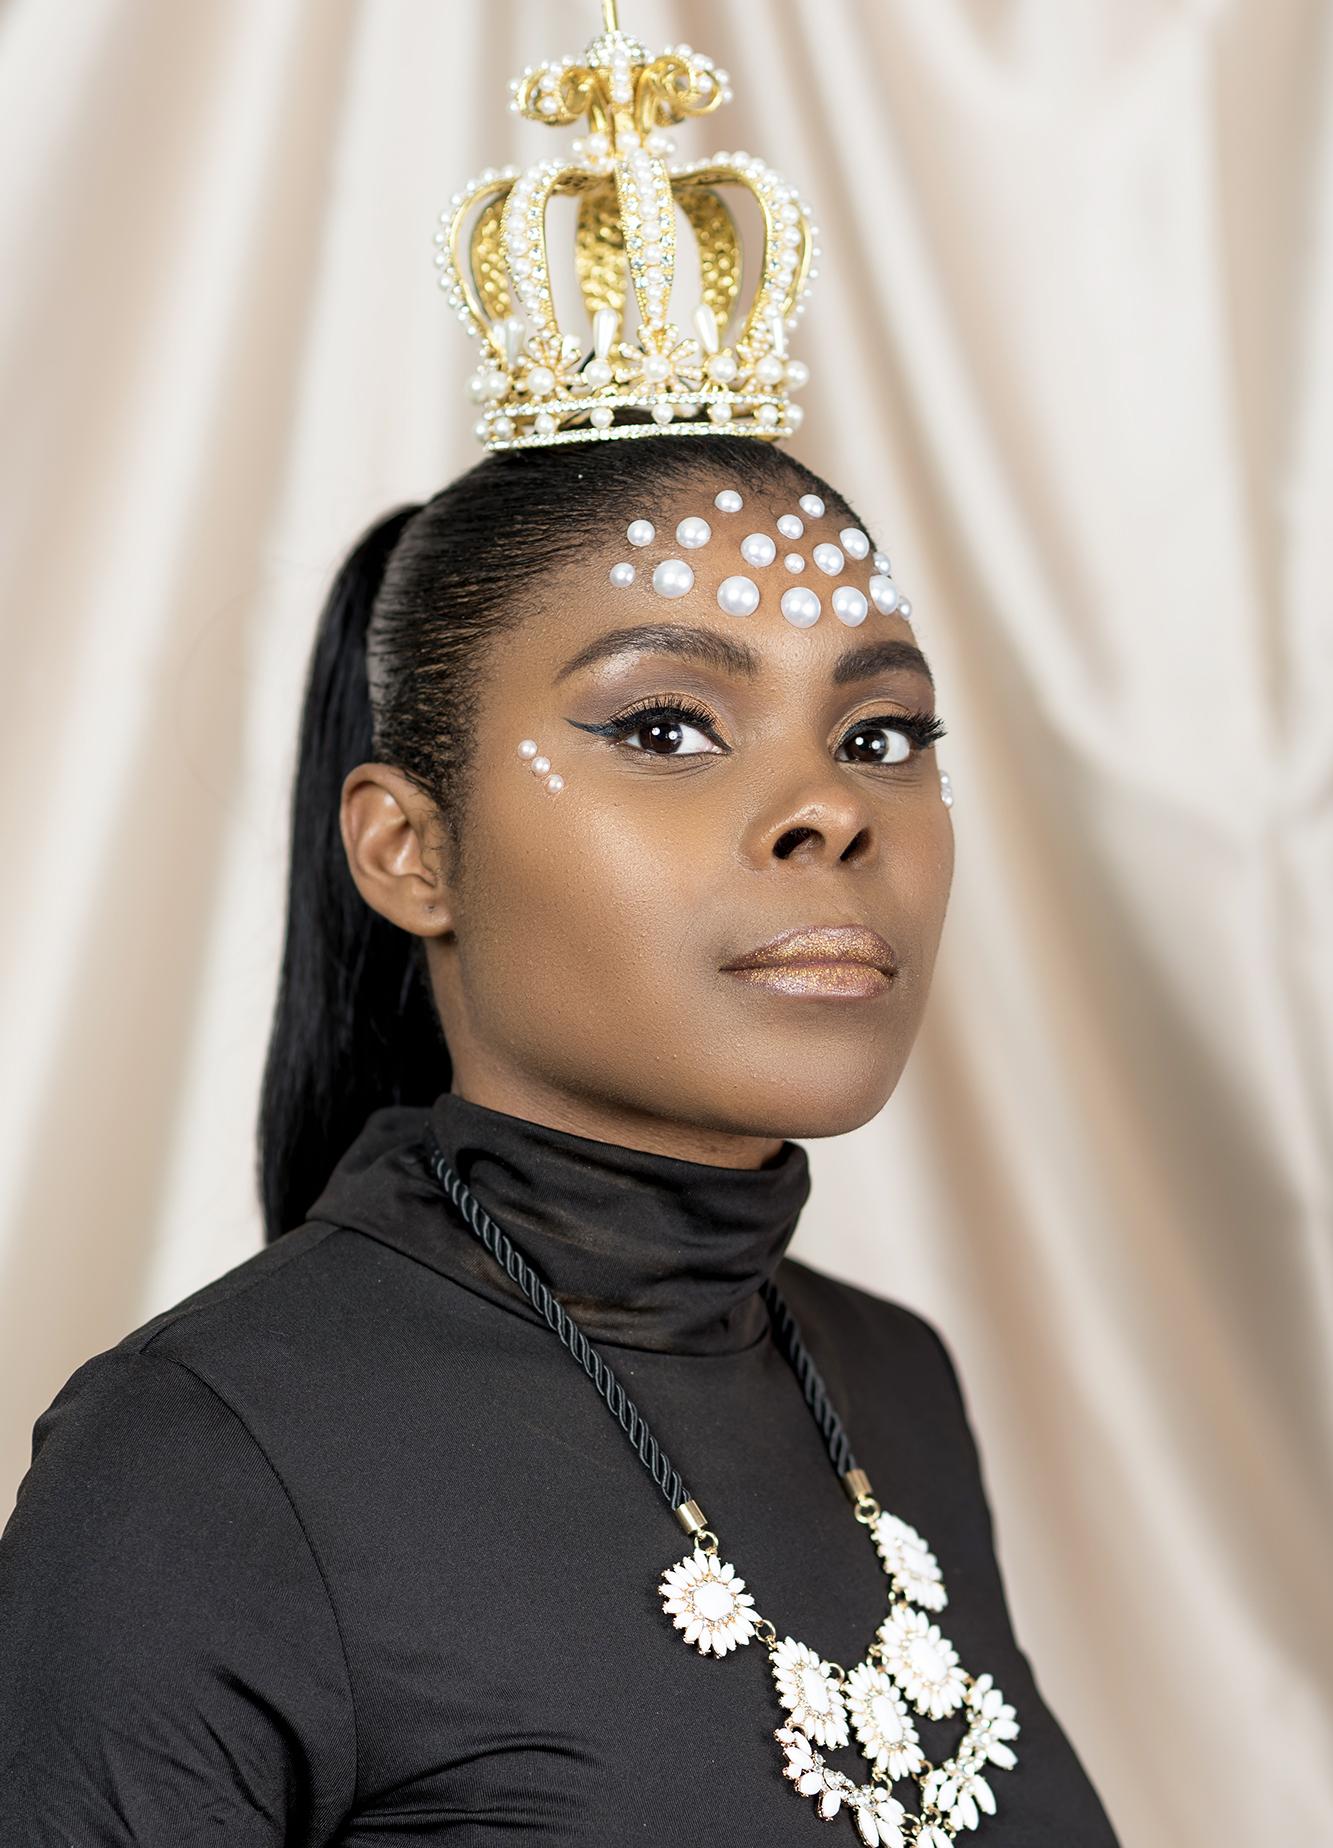 Photographer: @iipixphotography   Makeup Artist: @ officialjaimesweeney   Model:@ officialjaimesweeney